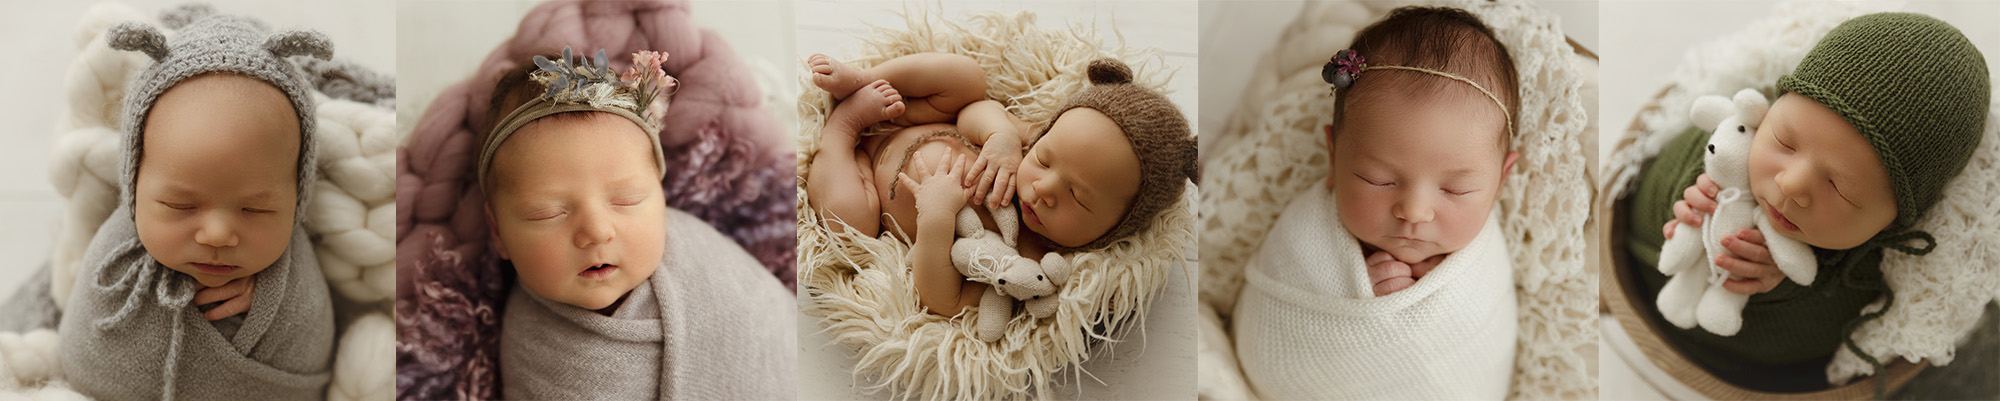 newbornmis